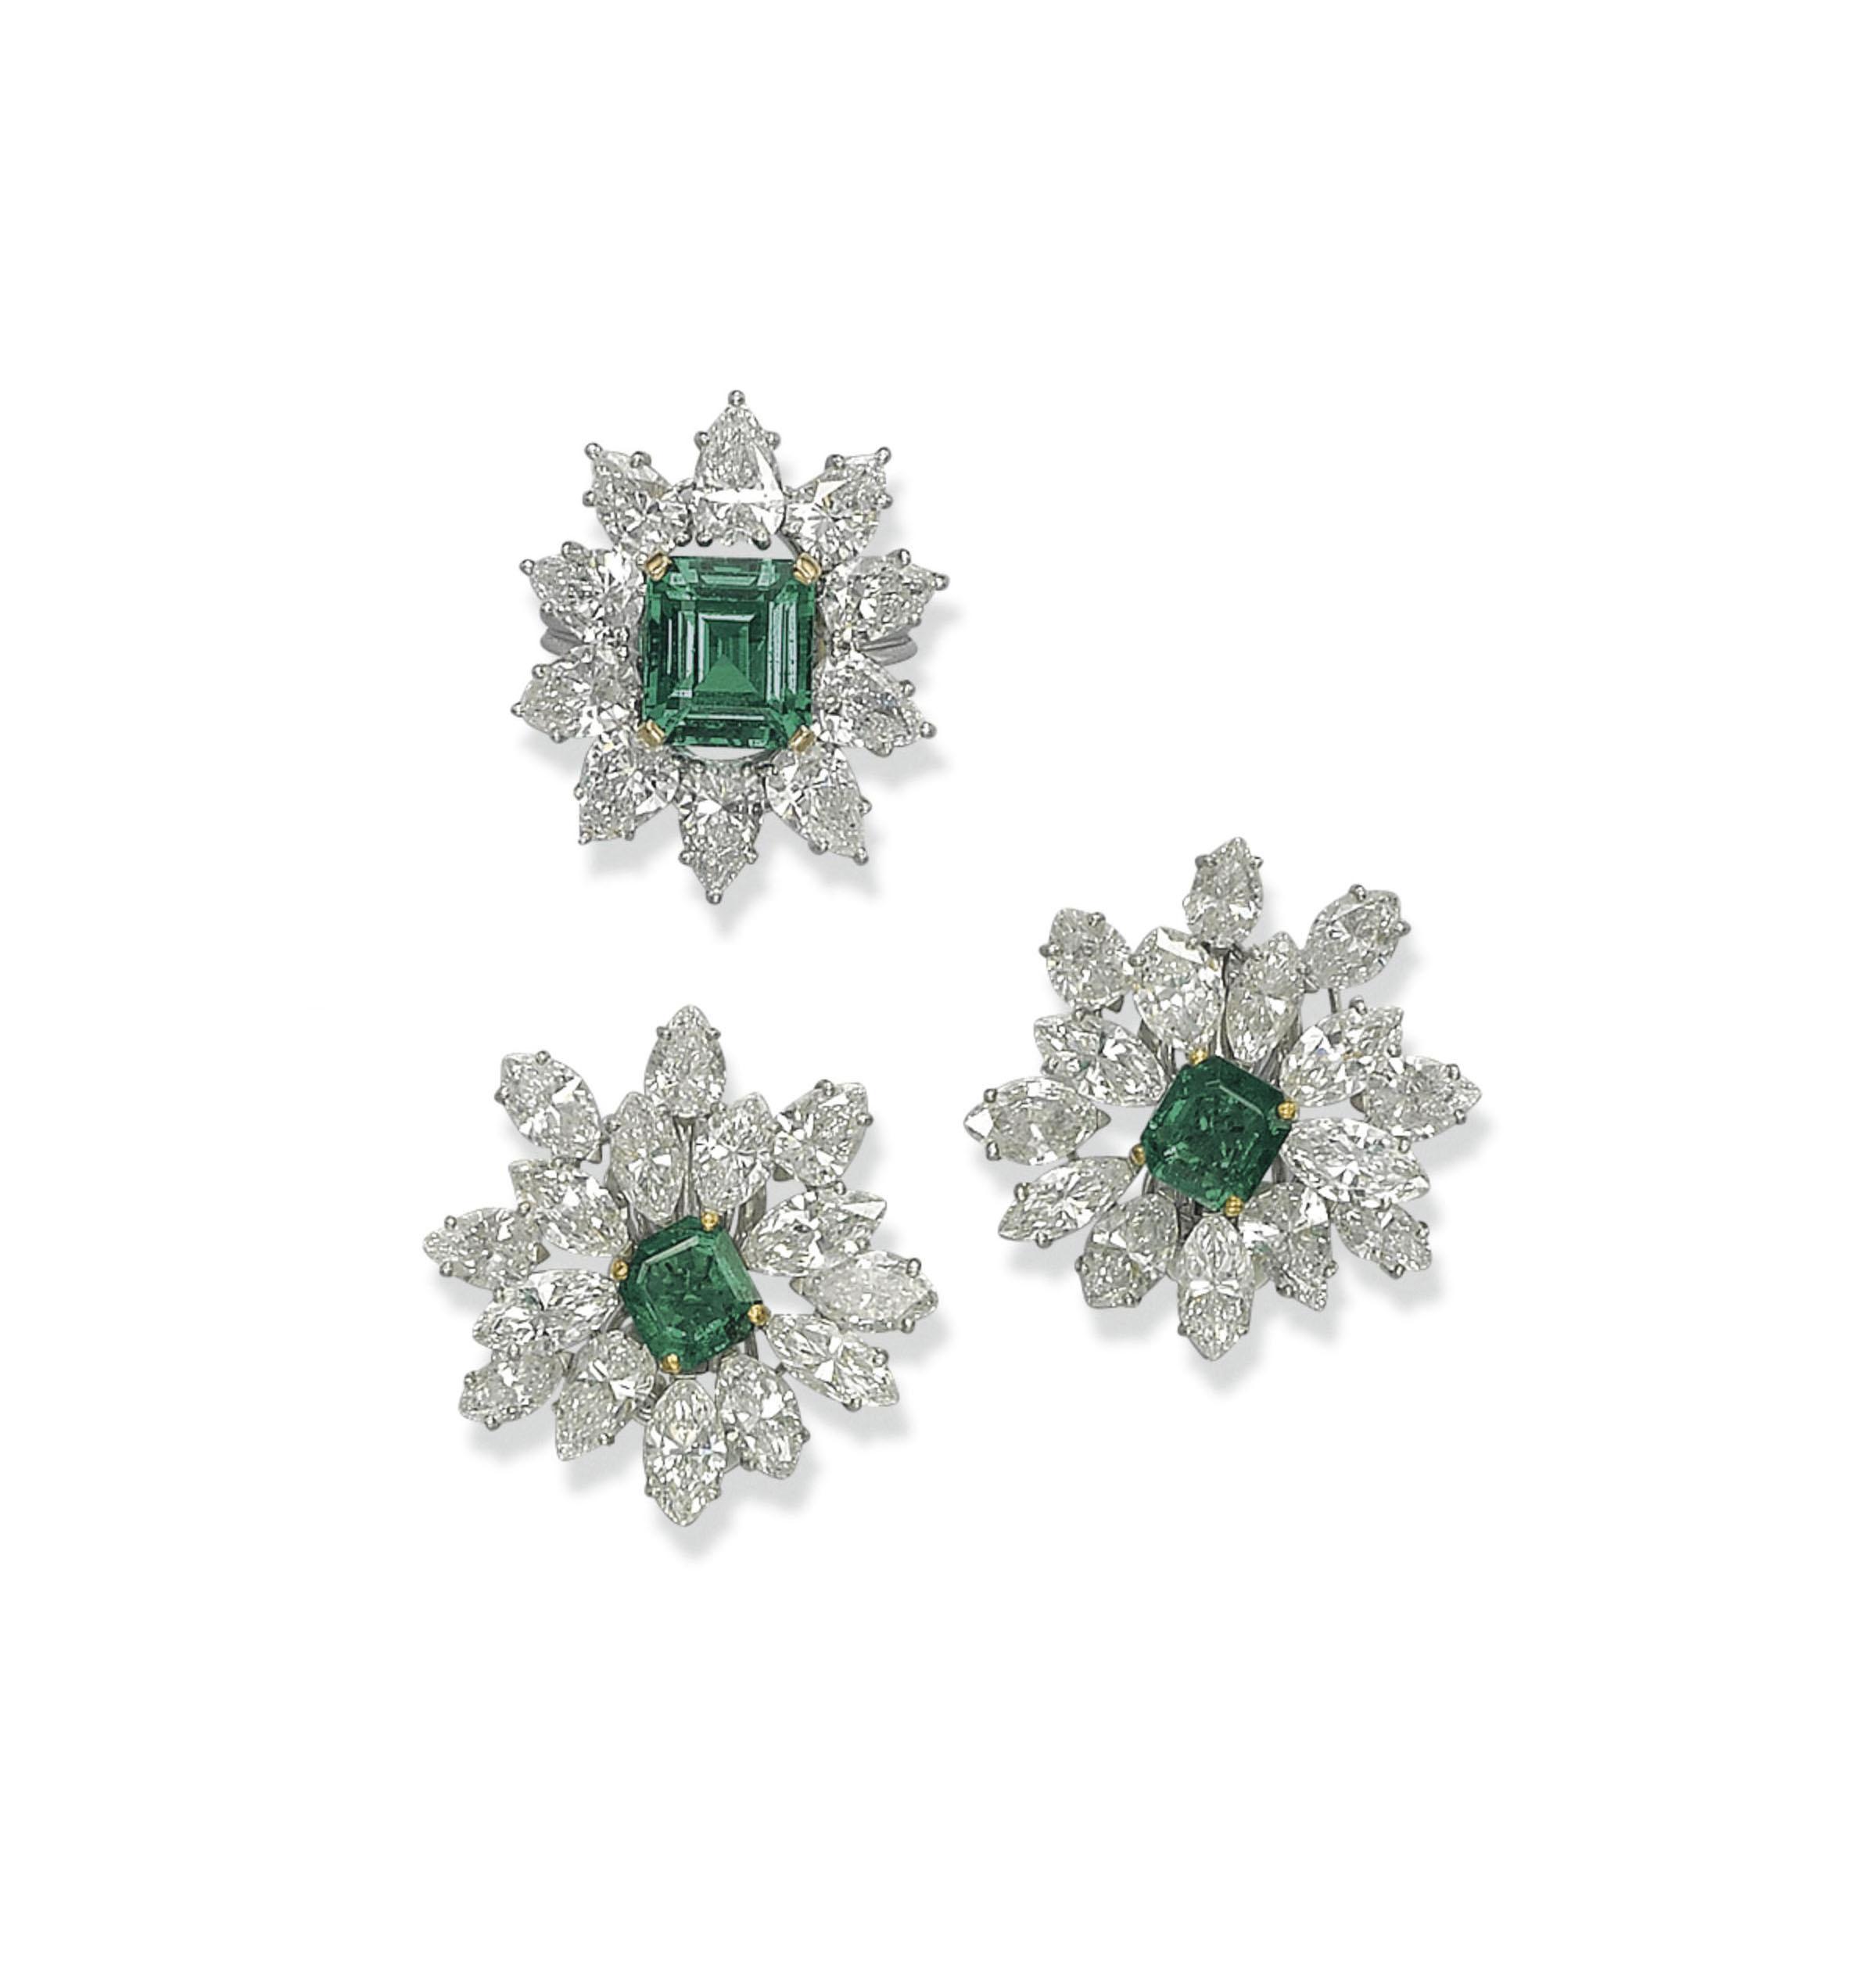 A SET OF EMERALD AND DIAMOND JEWELLERY, BY FARAONE